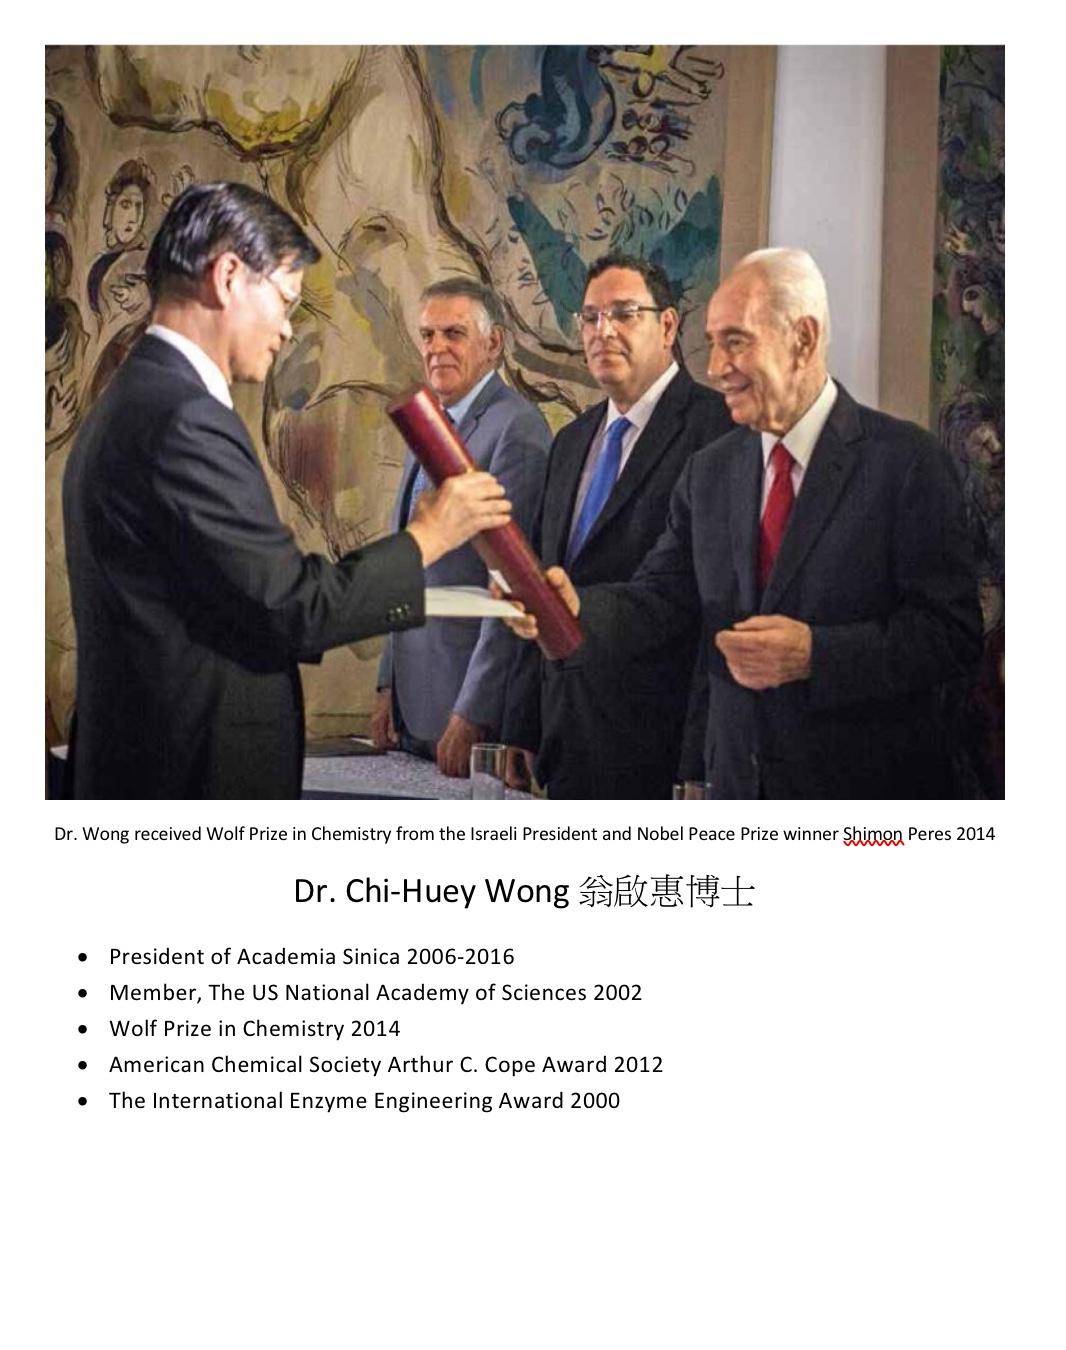 243. Dr. Chi-Huey Wong 翁啟惠博士